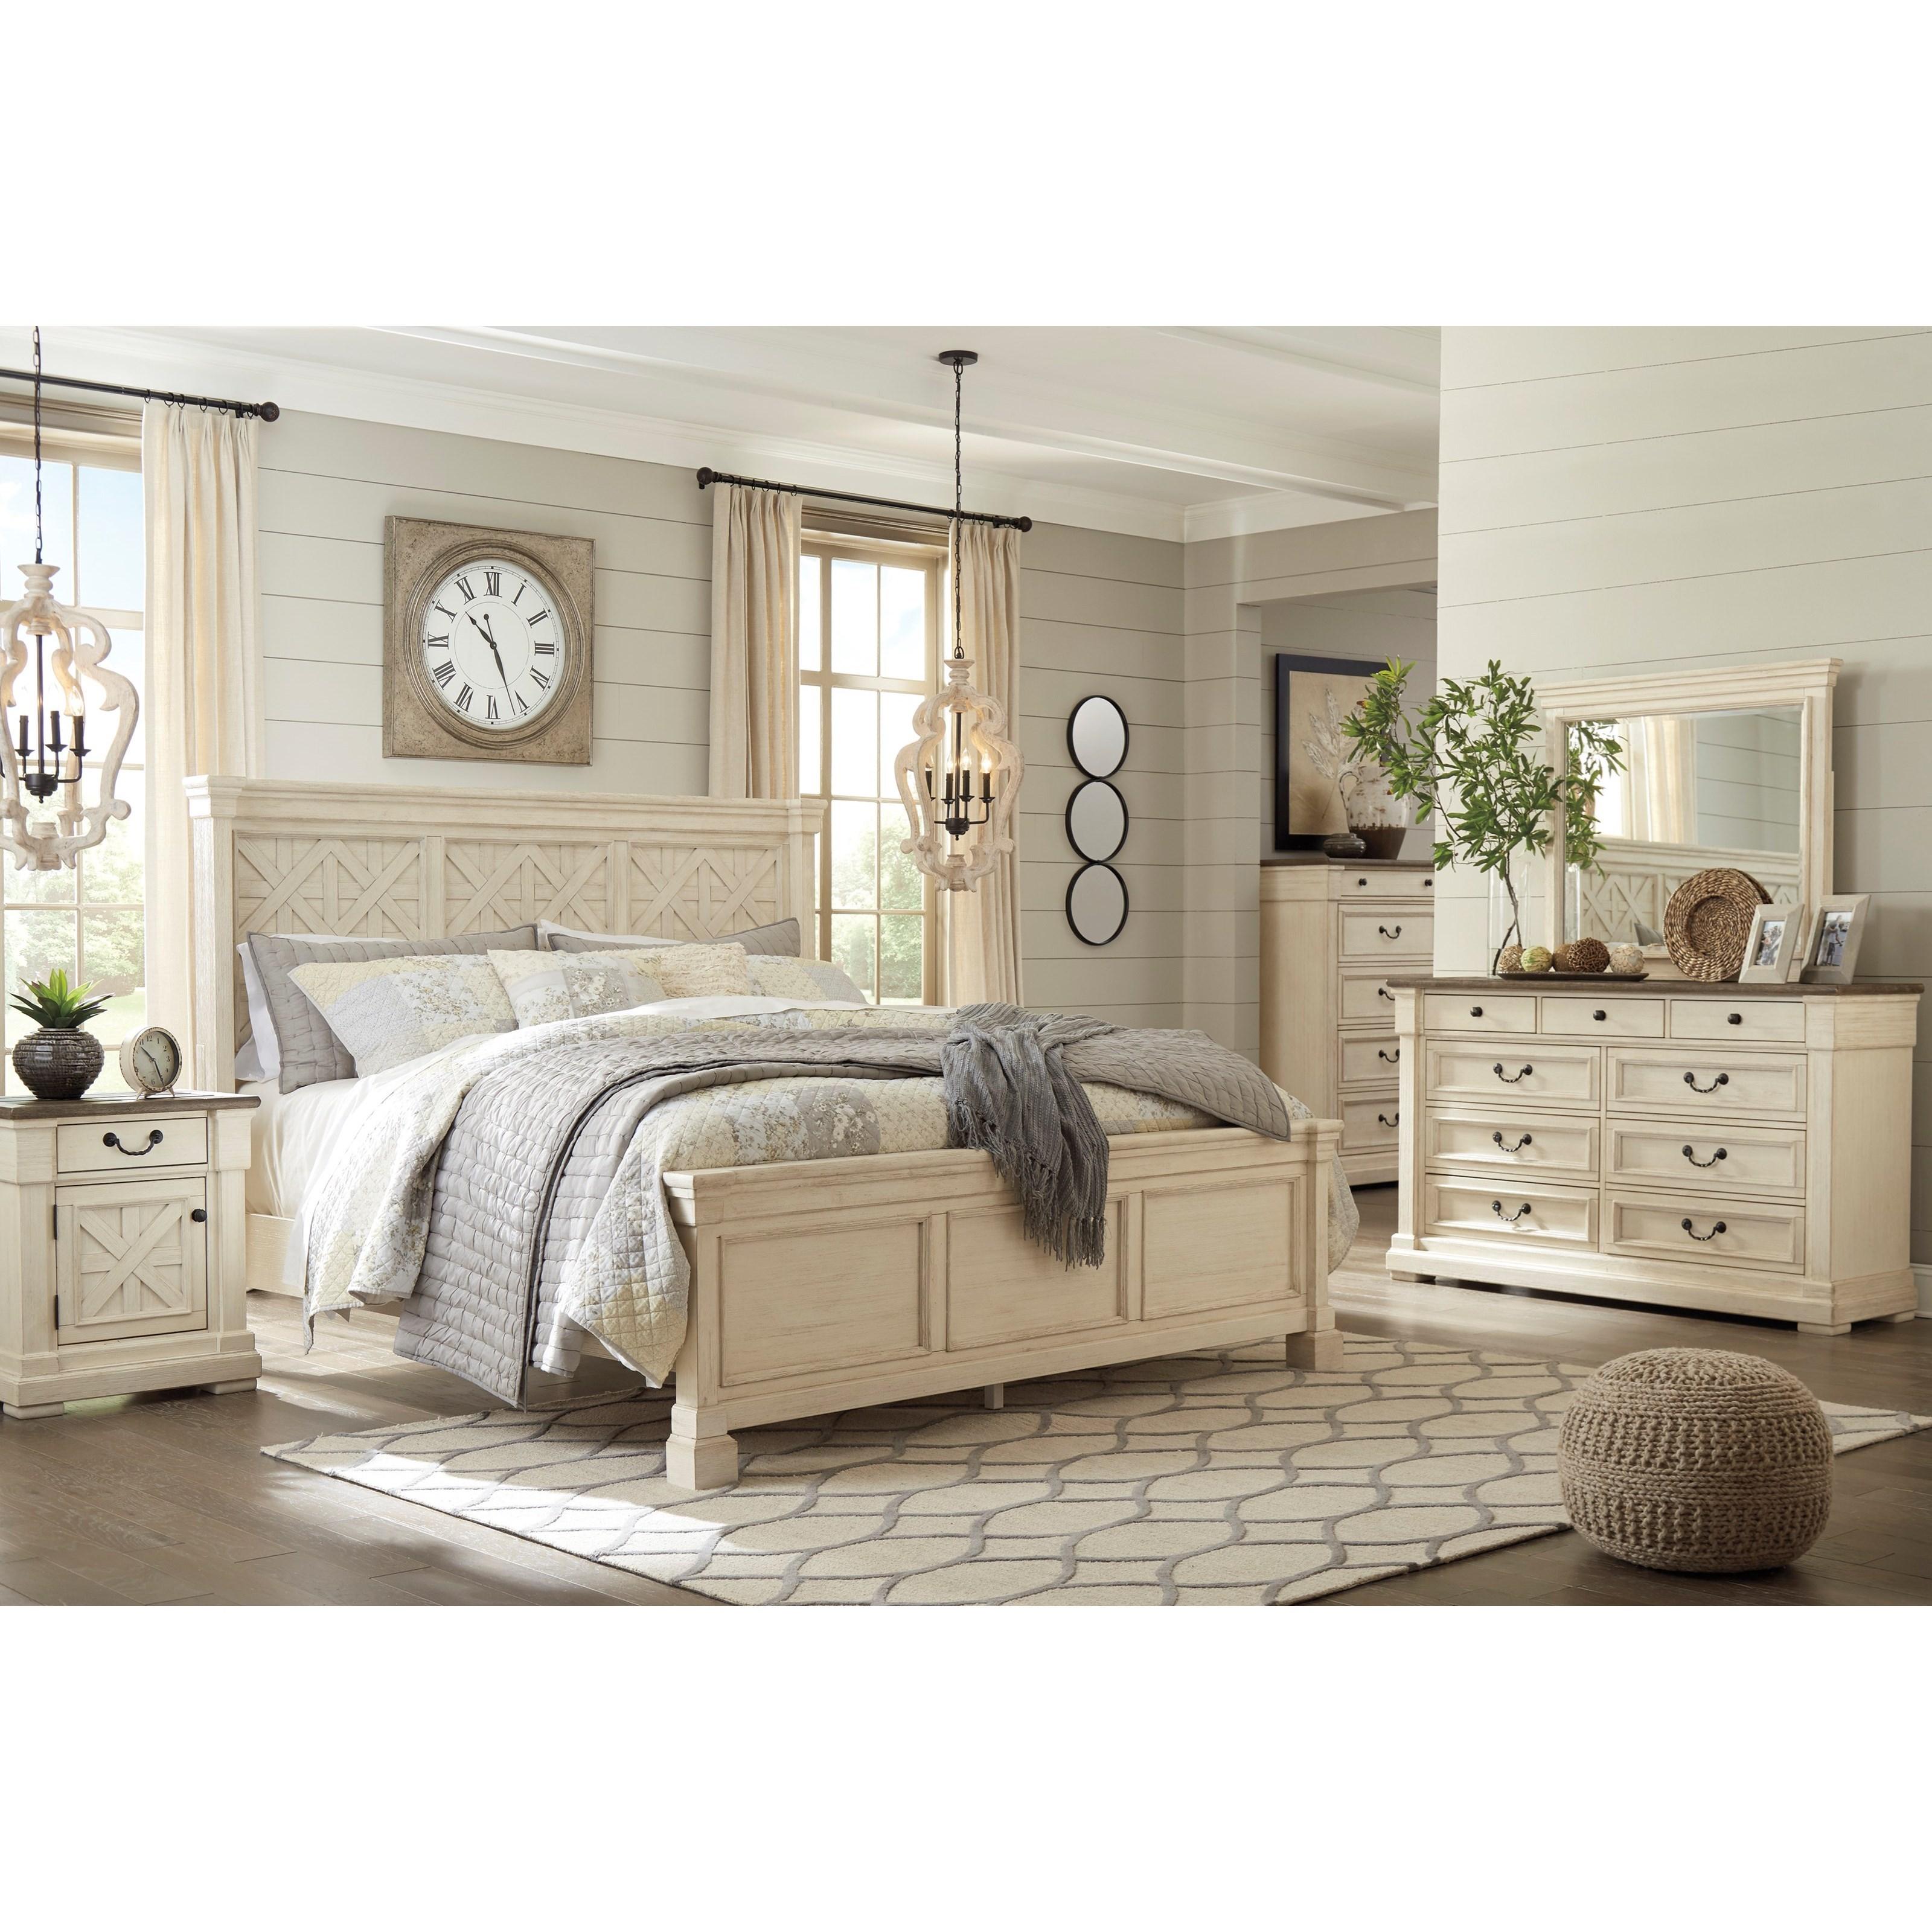 Ashley Signature Design Bolanburg Two Tone Dresser Bedroom Mirror Dunk Bright Furniture